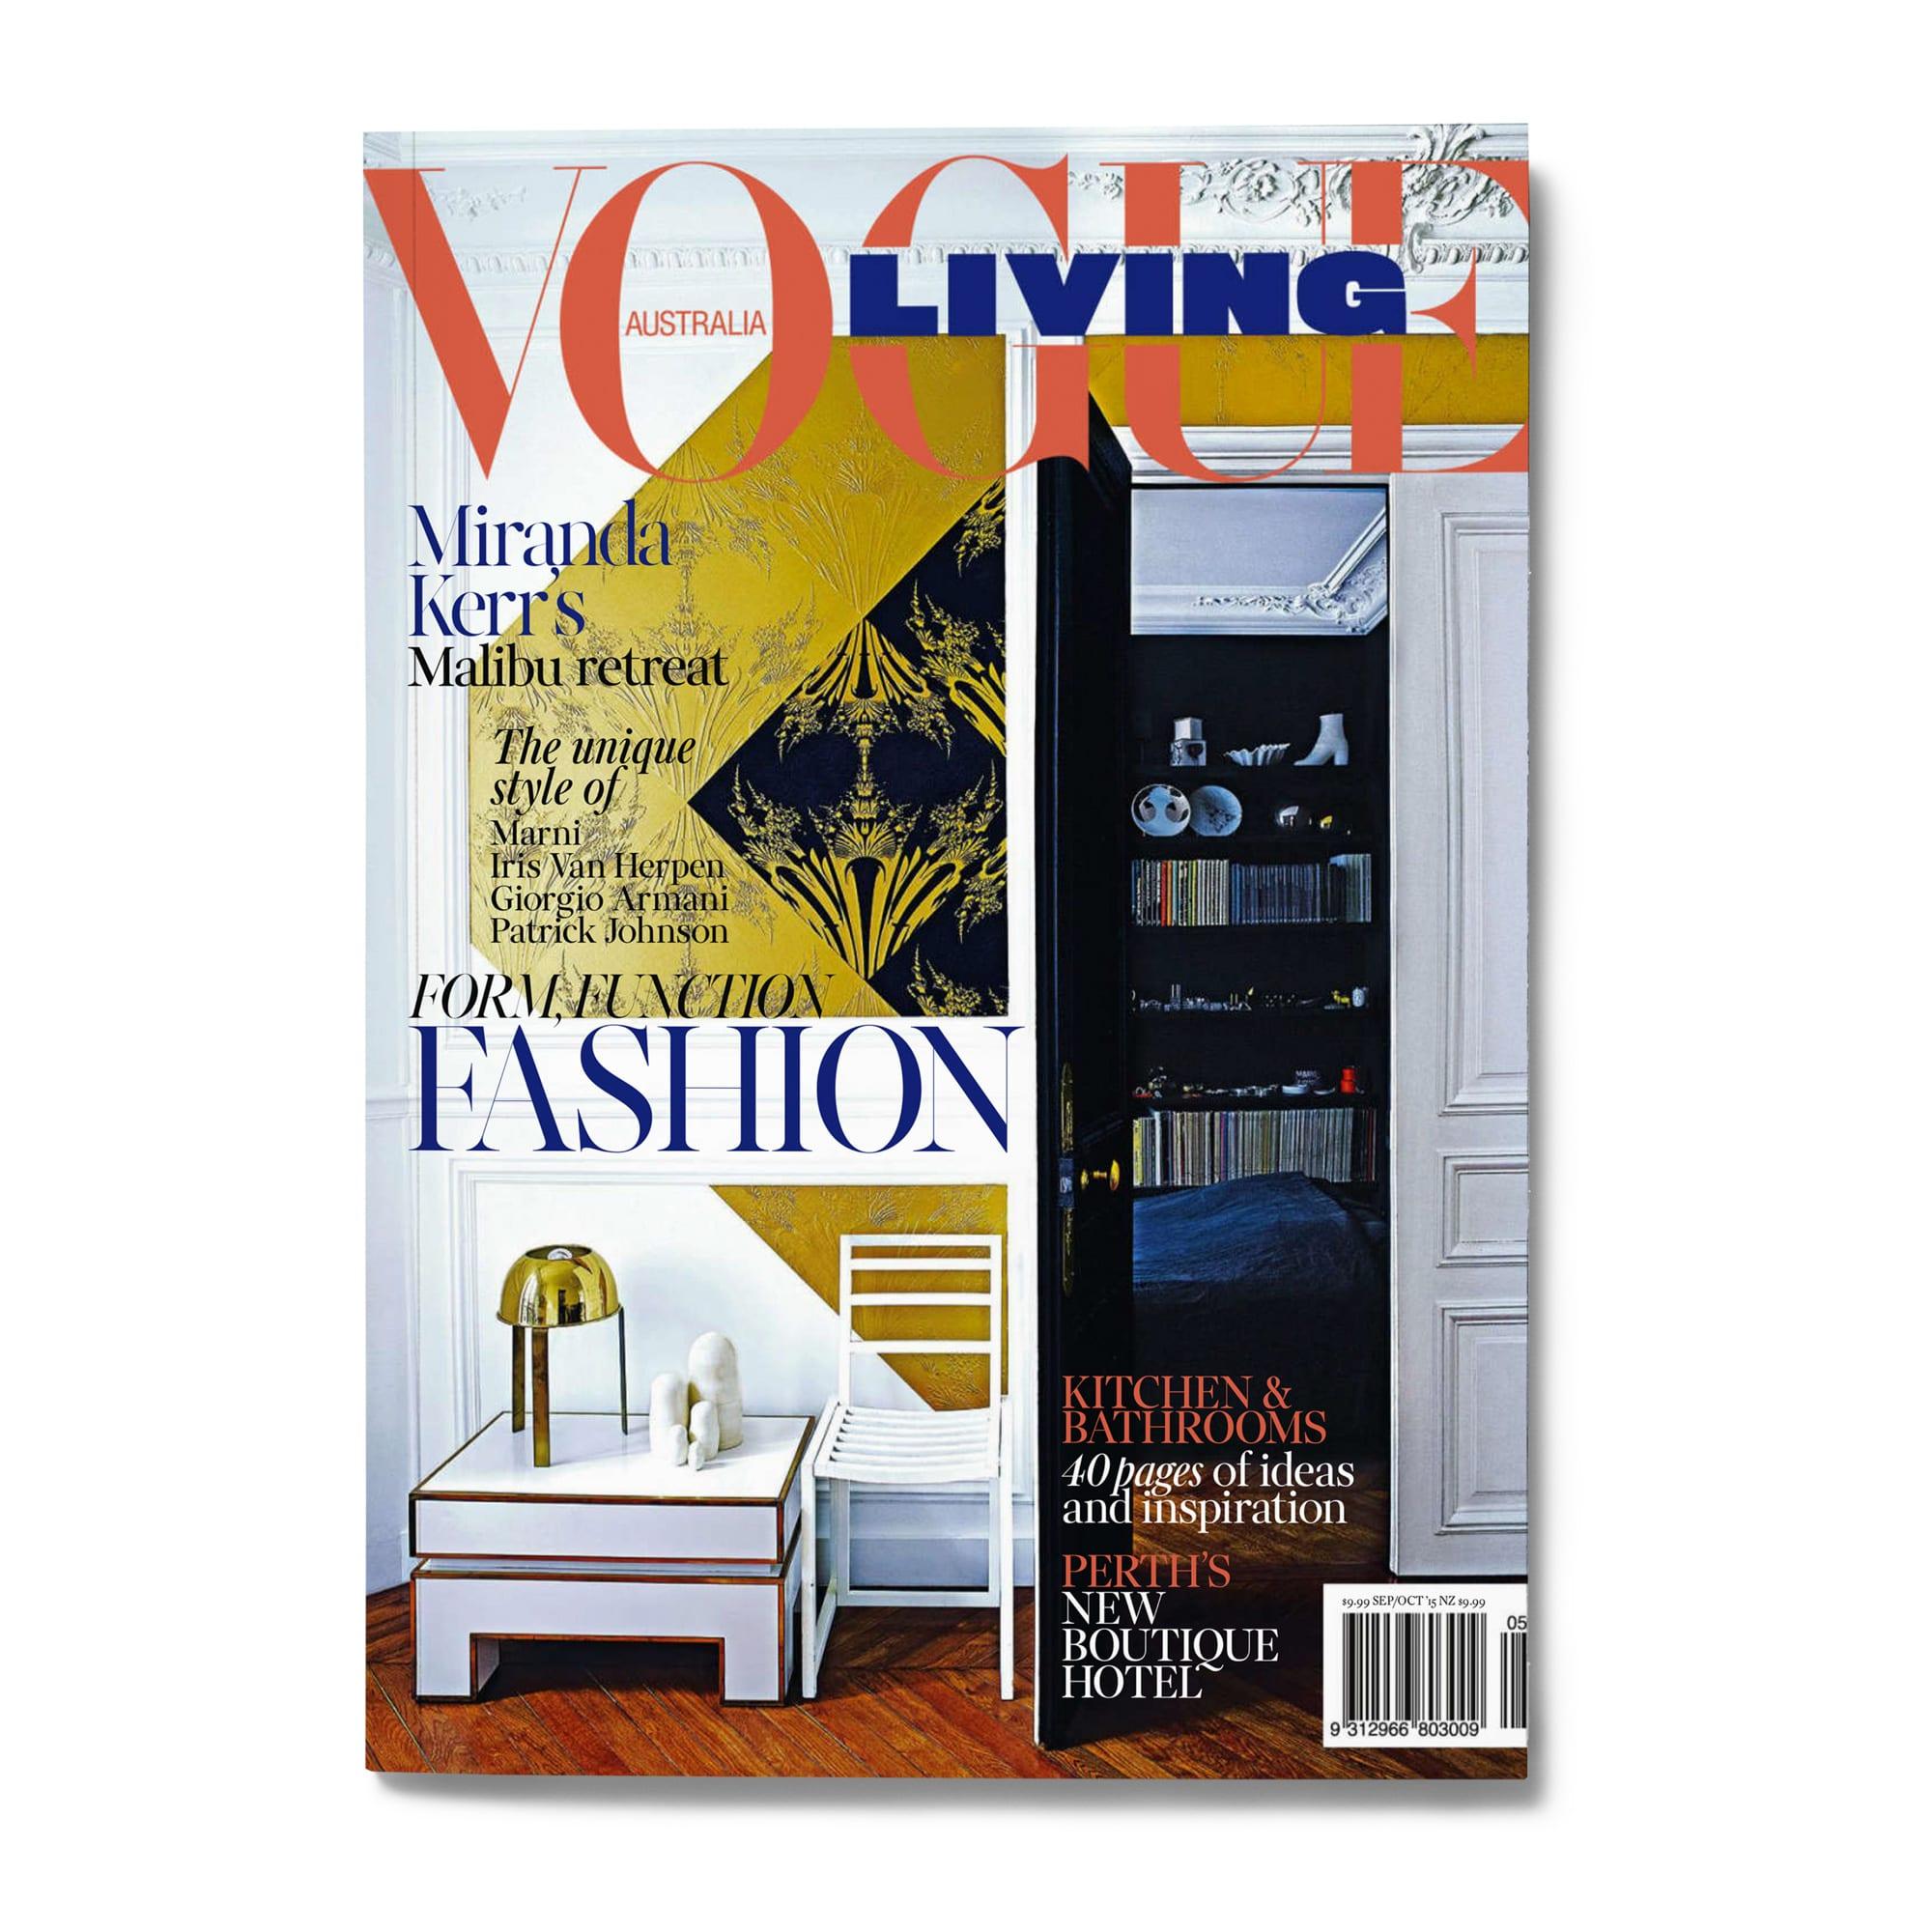 Vogue_ - DESIGN BY MIGUEL SOEIRO